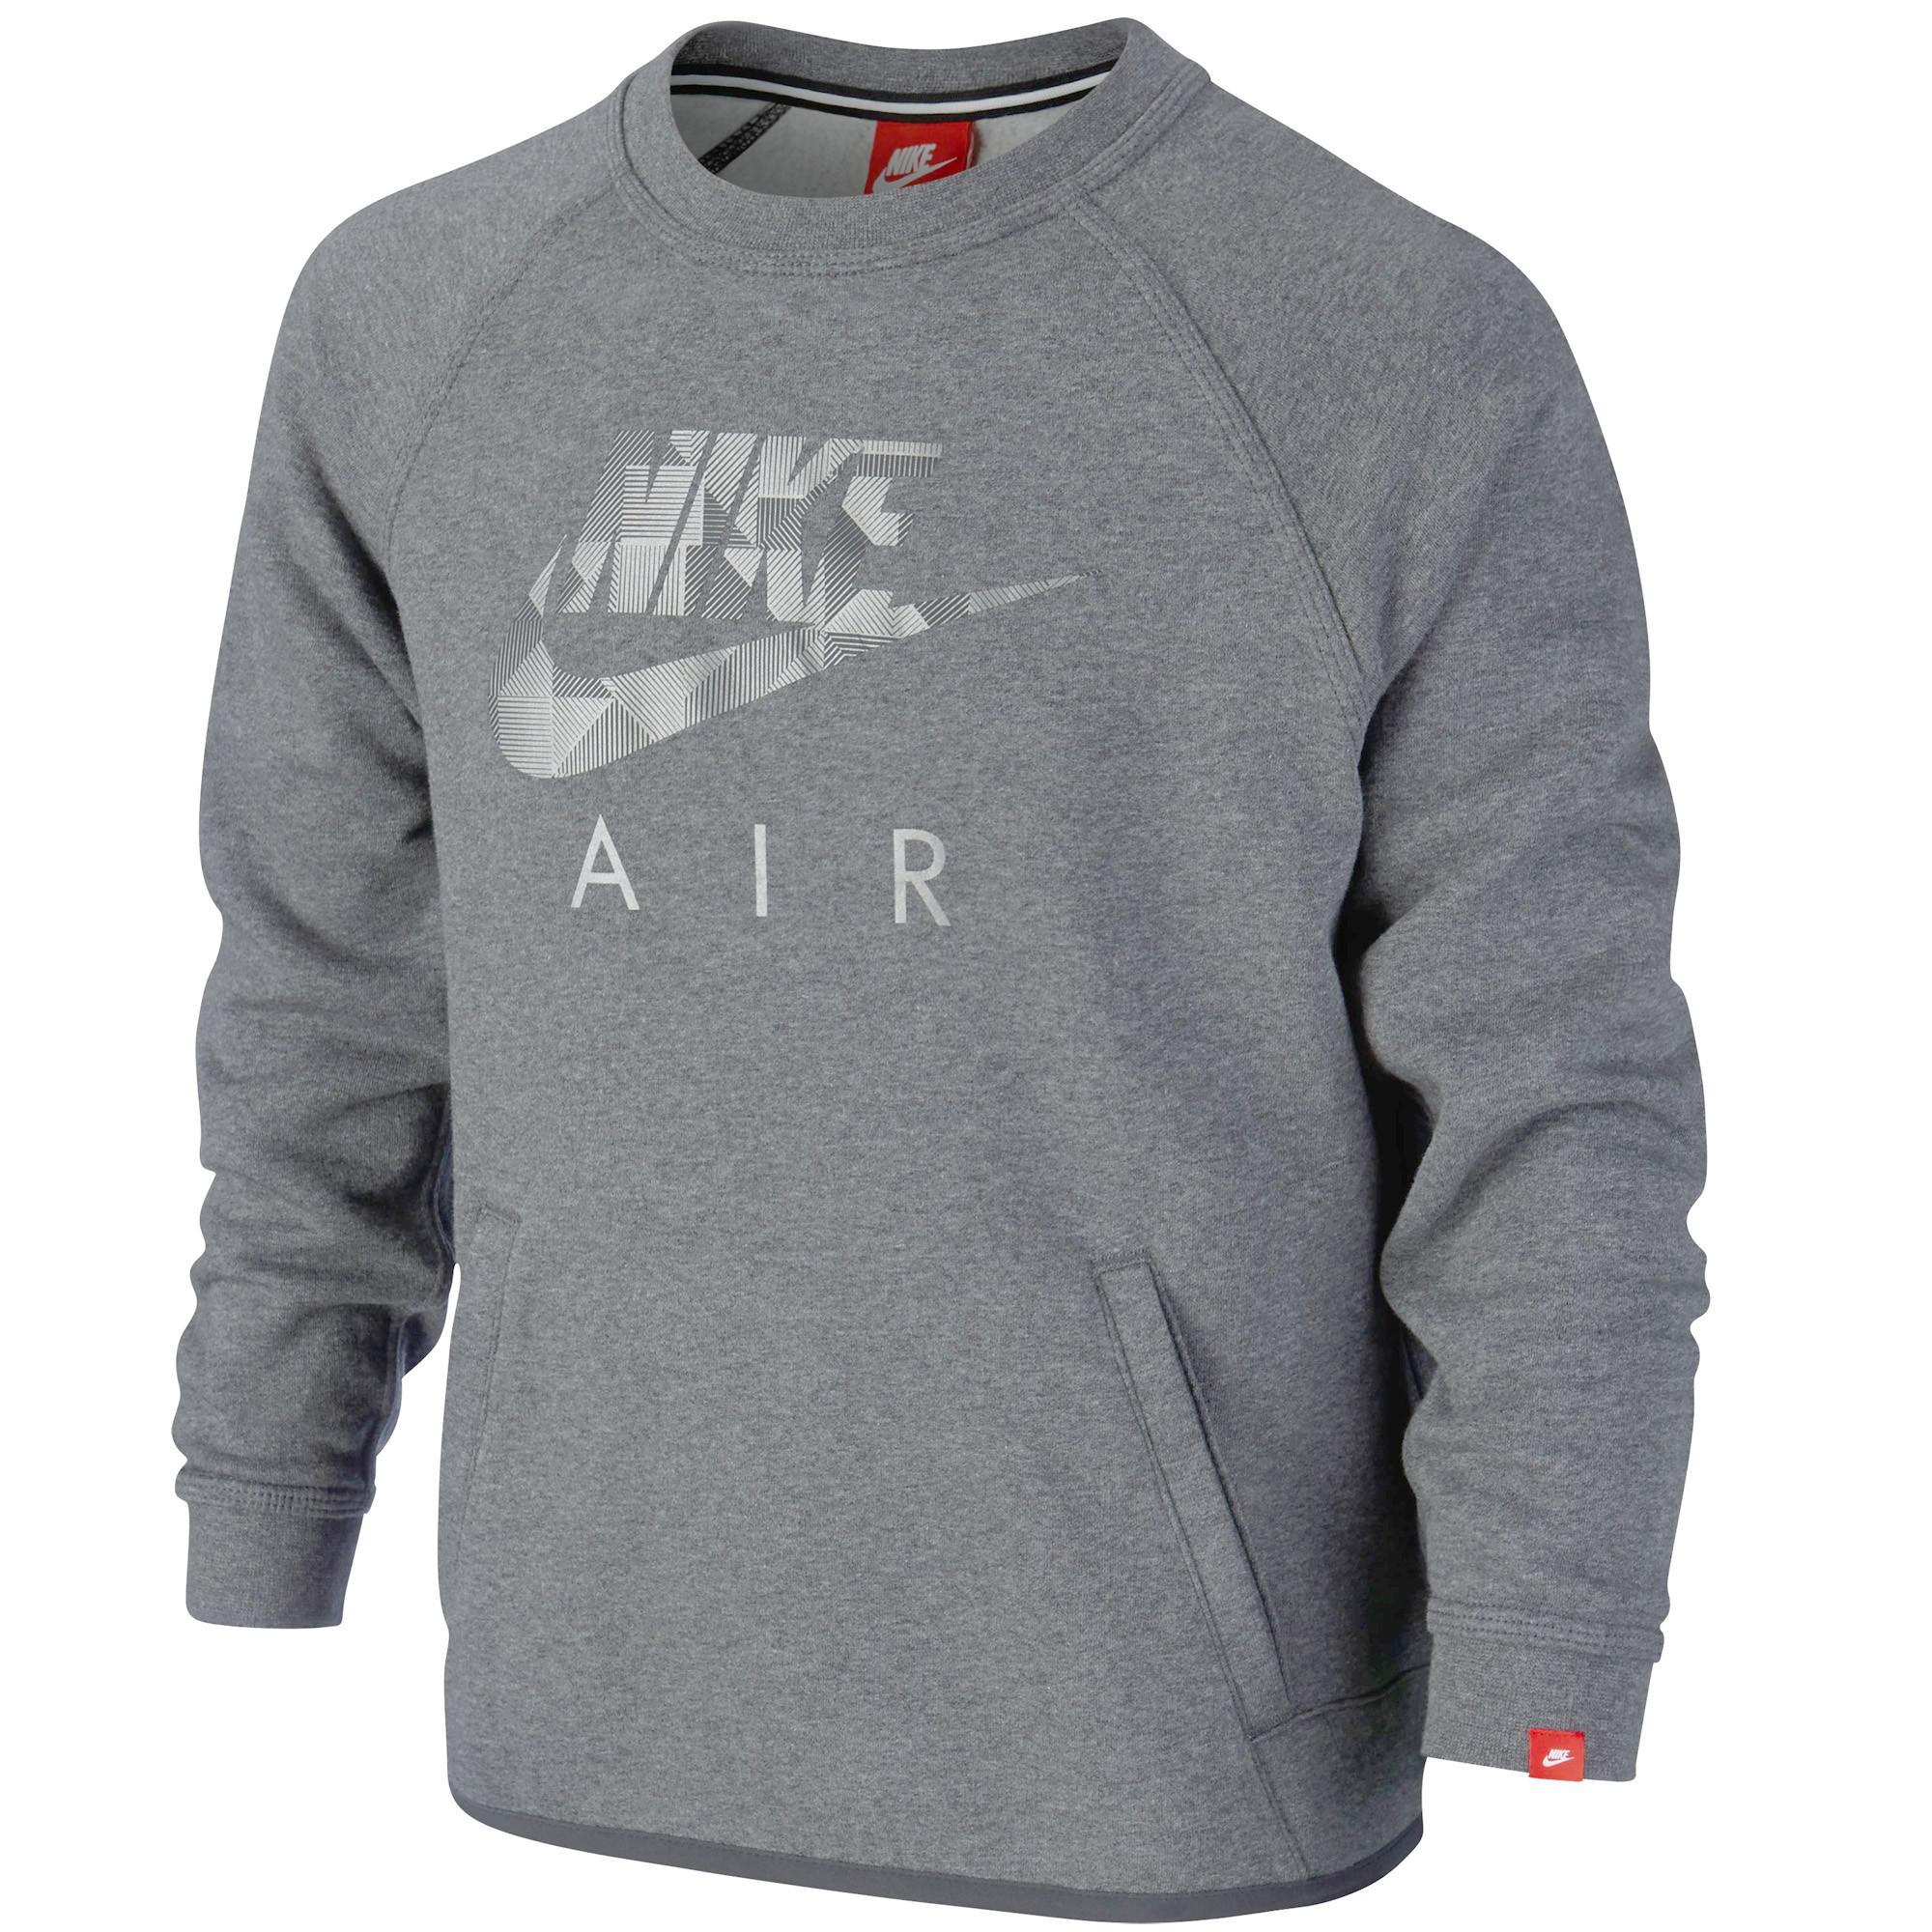 2235da05 Nike Air Boys Brushed Fleece Flash Crew Sweatshirt - Grey - Tennisnuts.com